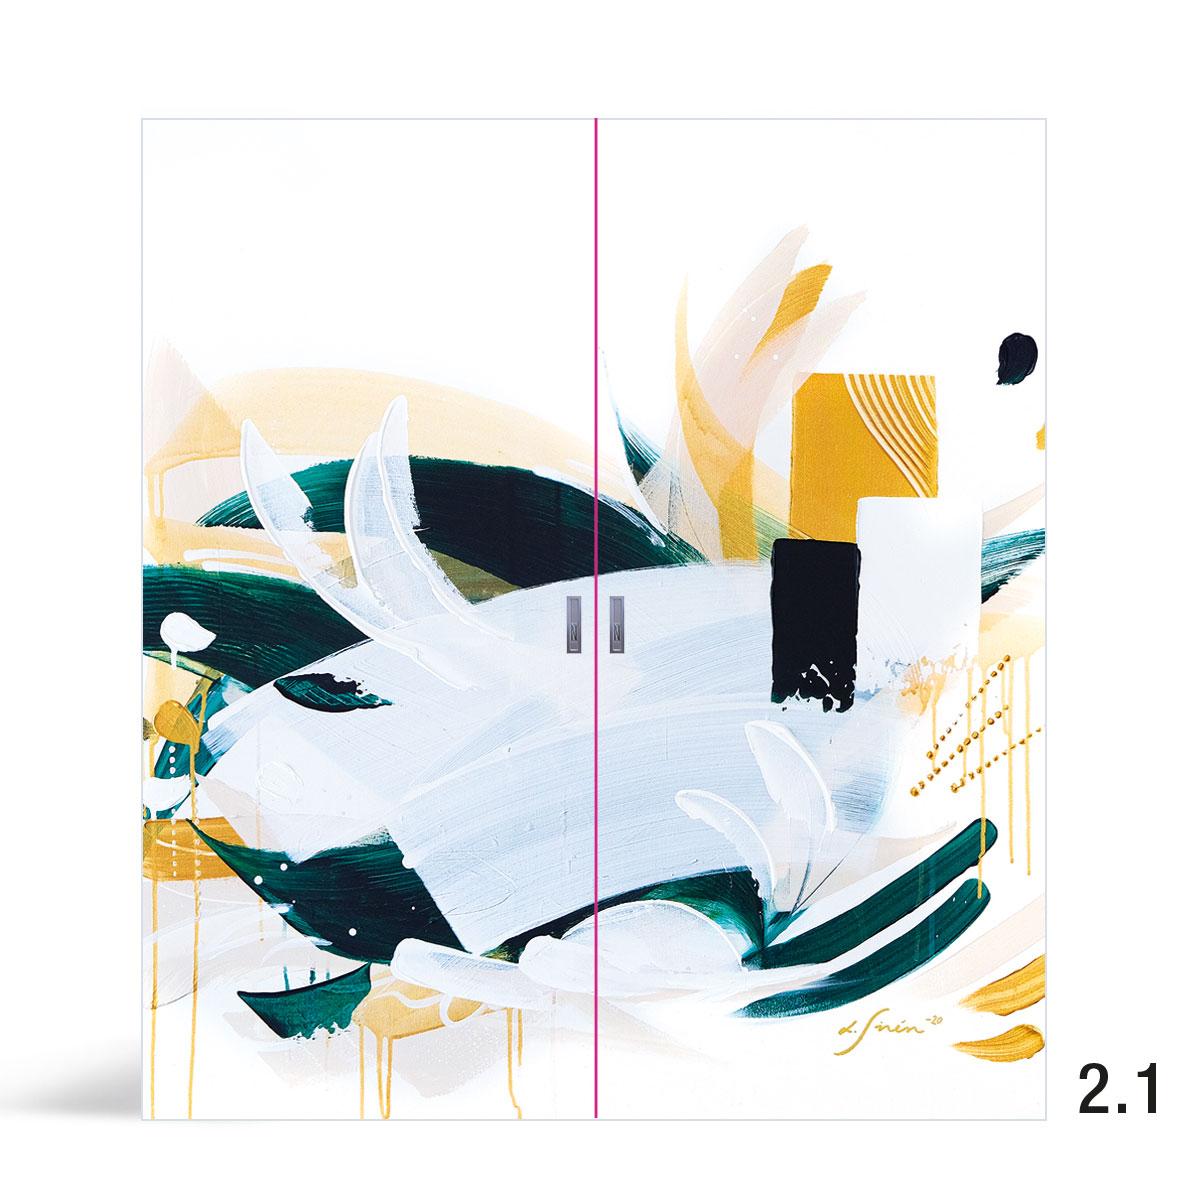 Liune Taide - D20 by Lotta Sirén - Tres pariovi